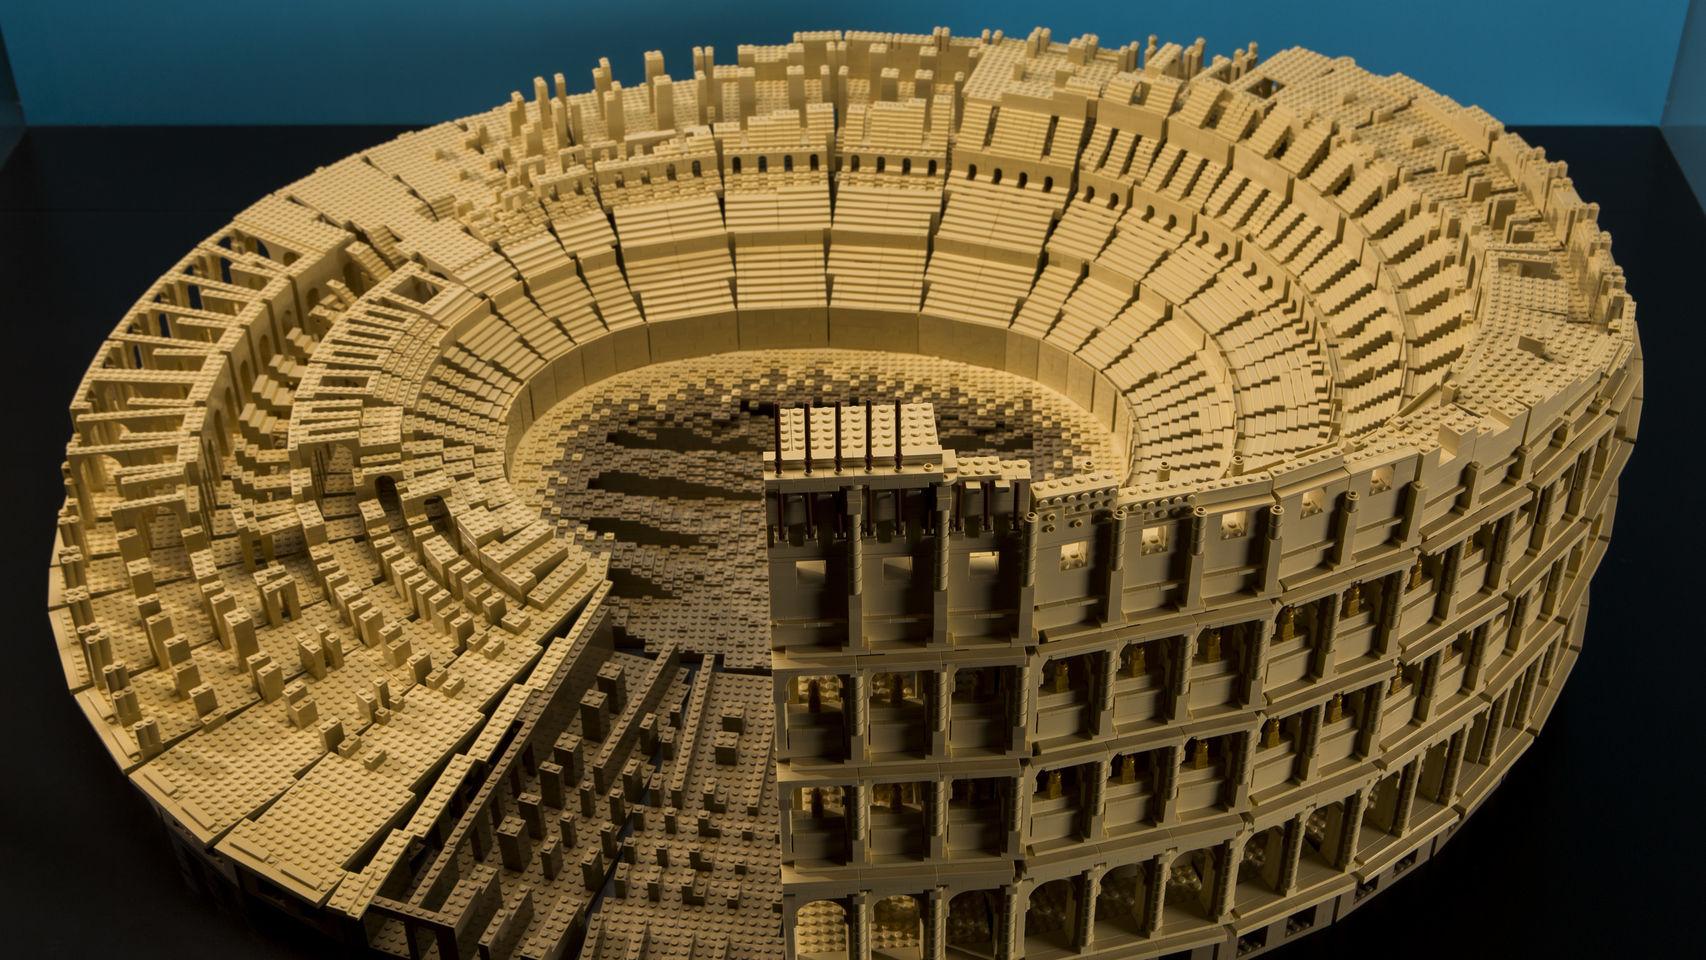 Espectacular-Coliseo-Roma-plastico_114748944_3287039_1706x960